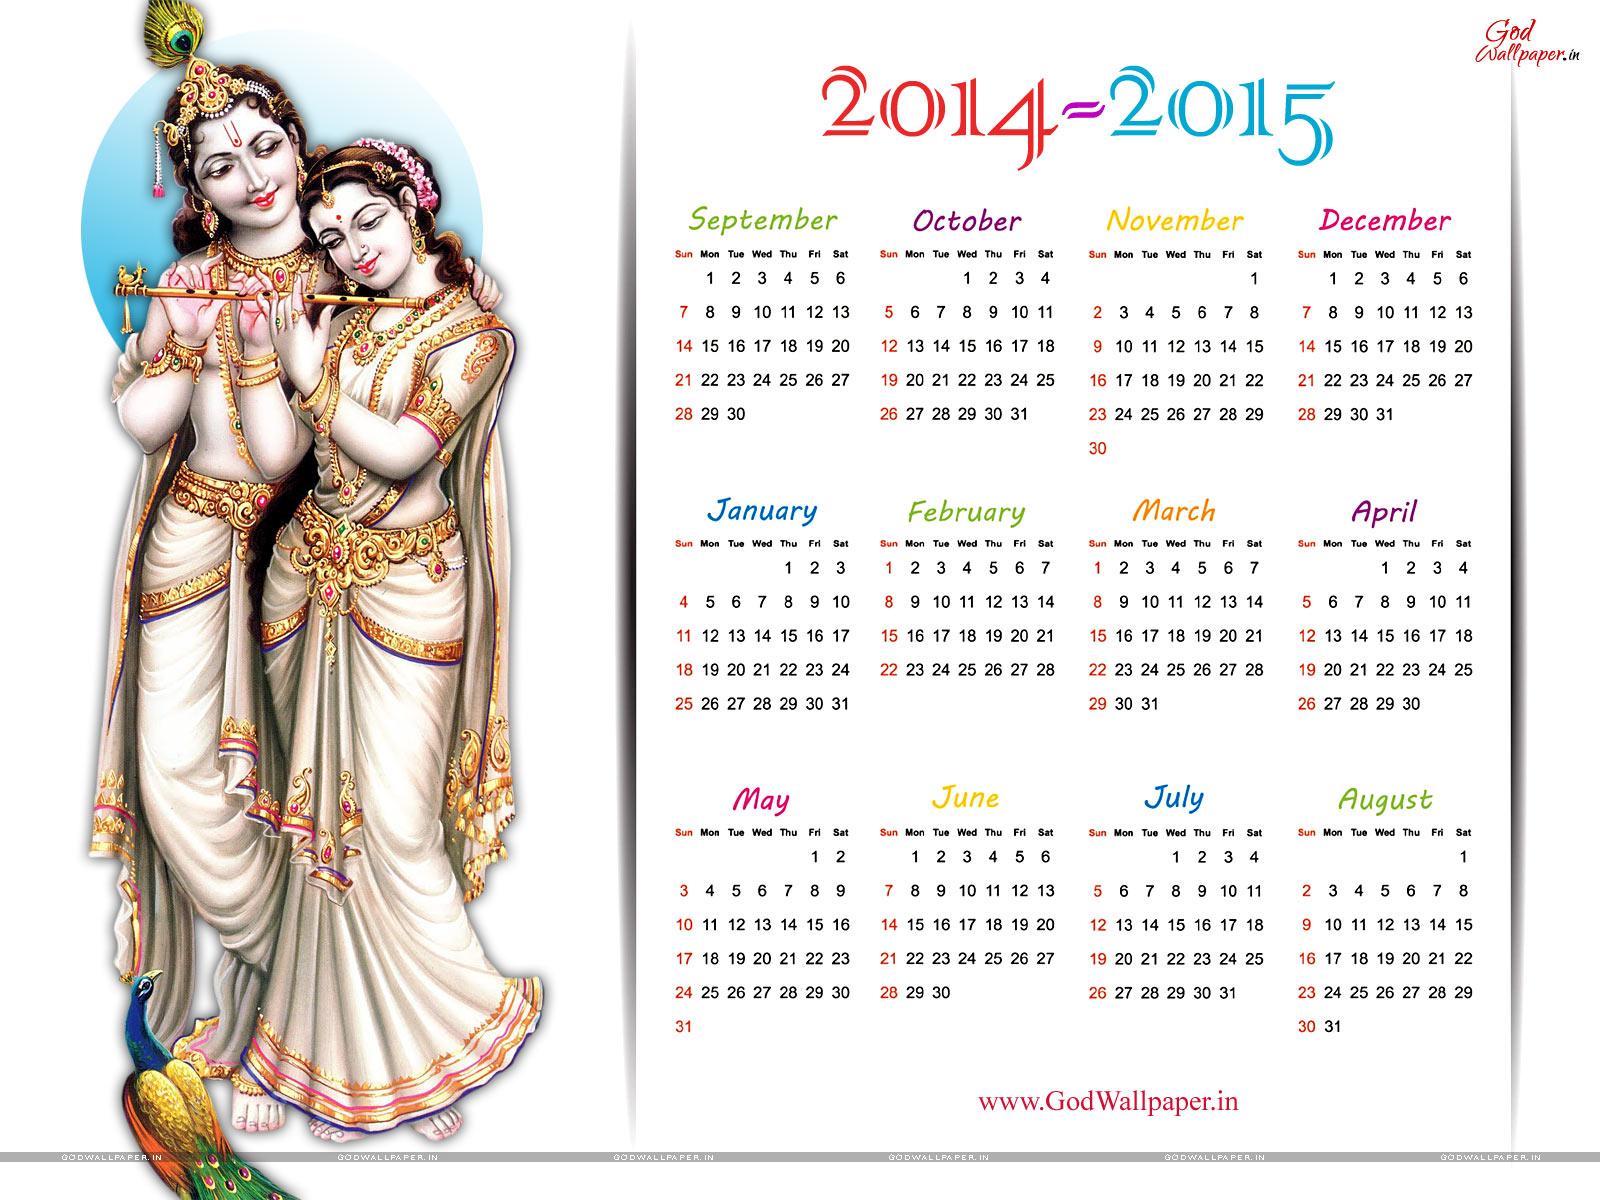 Hindu God Wallpapers Desktop Calendars Wallpaper 2015 Download 1600x1200